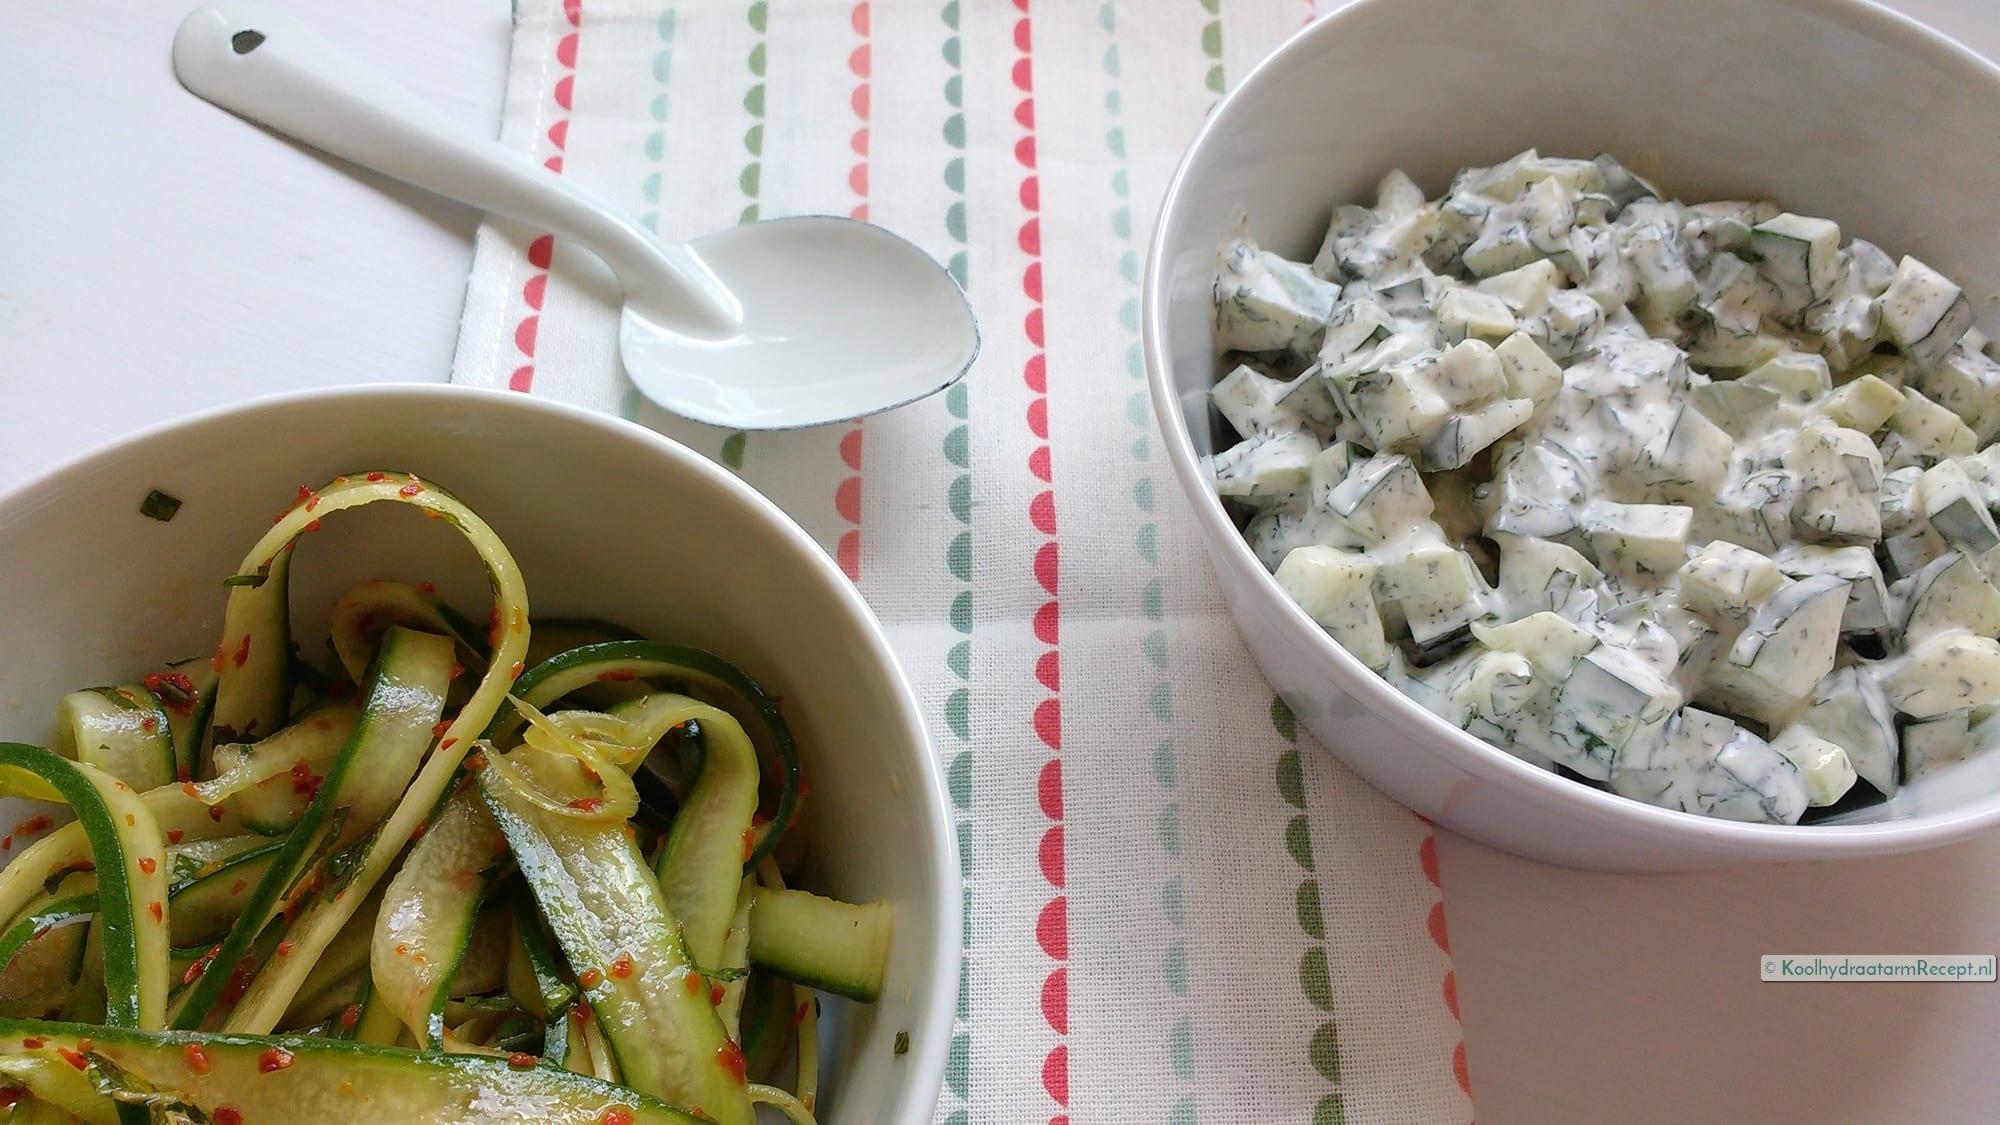 Komkommersalade 2x anders